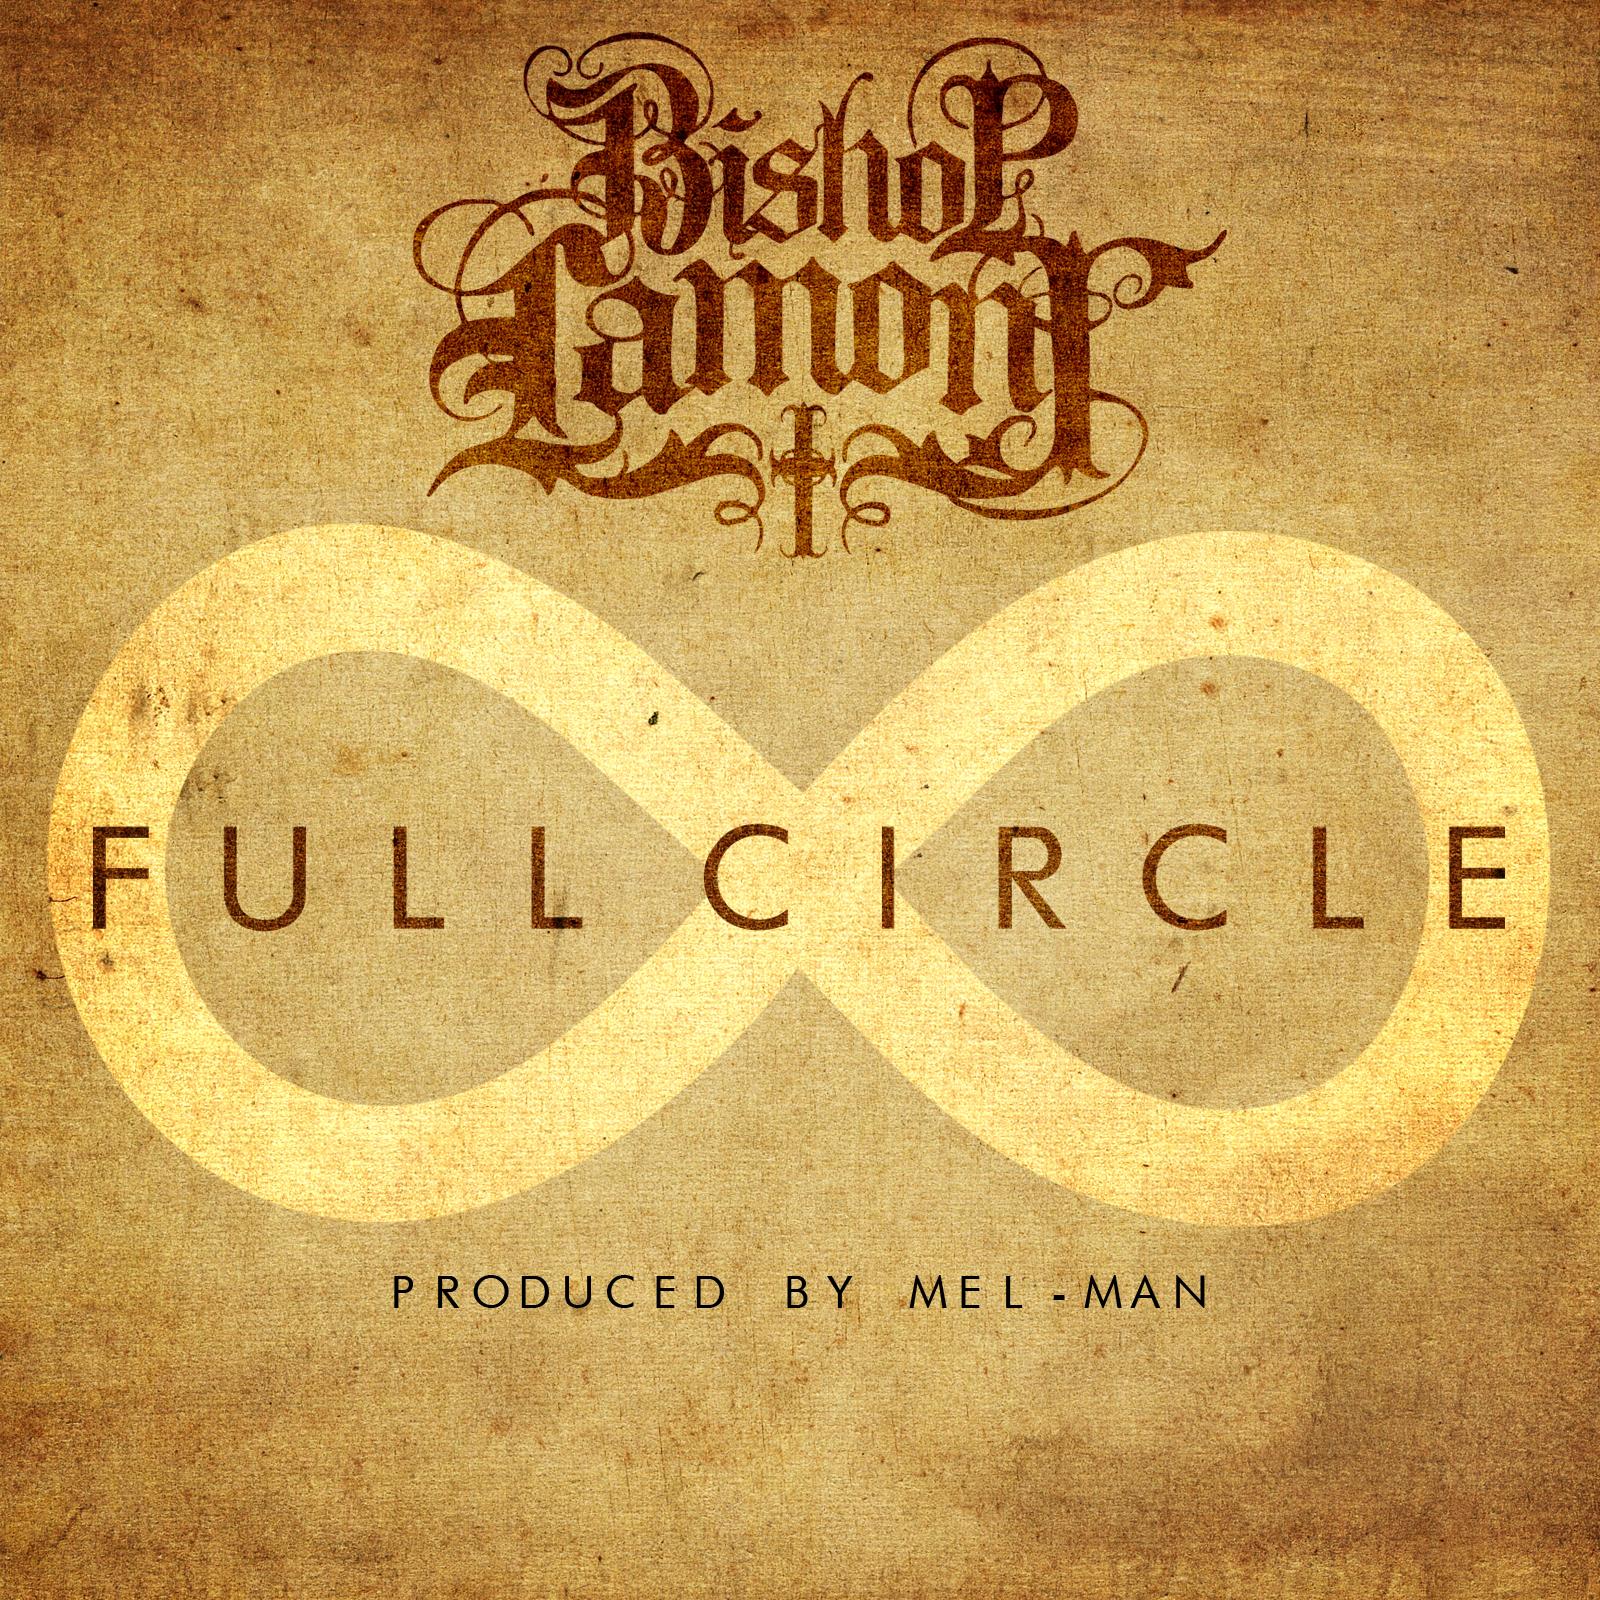 FULL CIRCLE_COVER ART_FINAL_high res.jpg